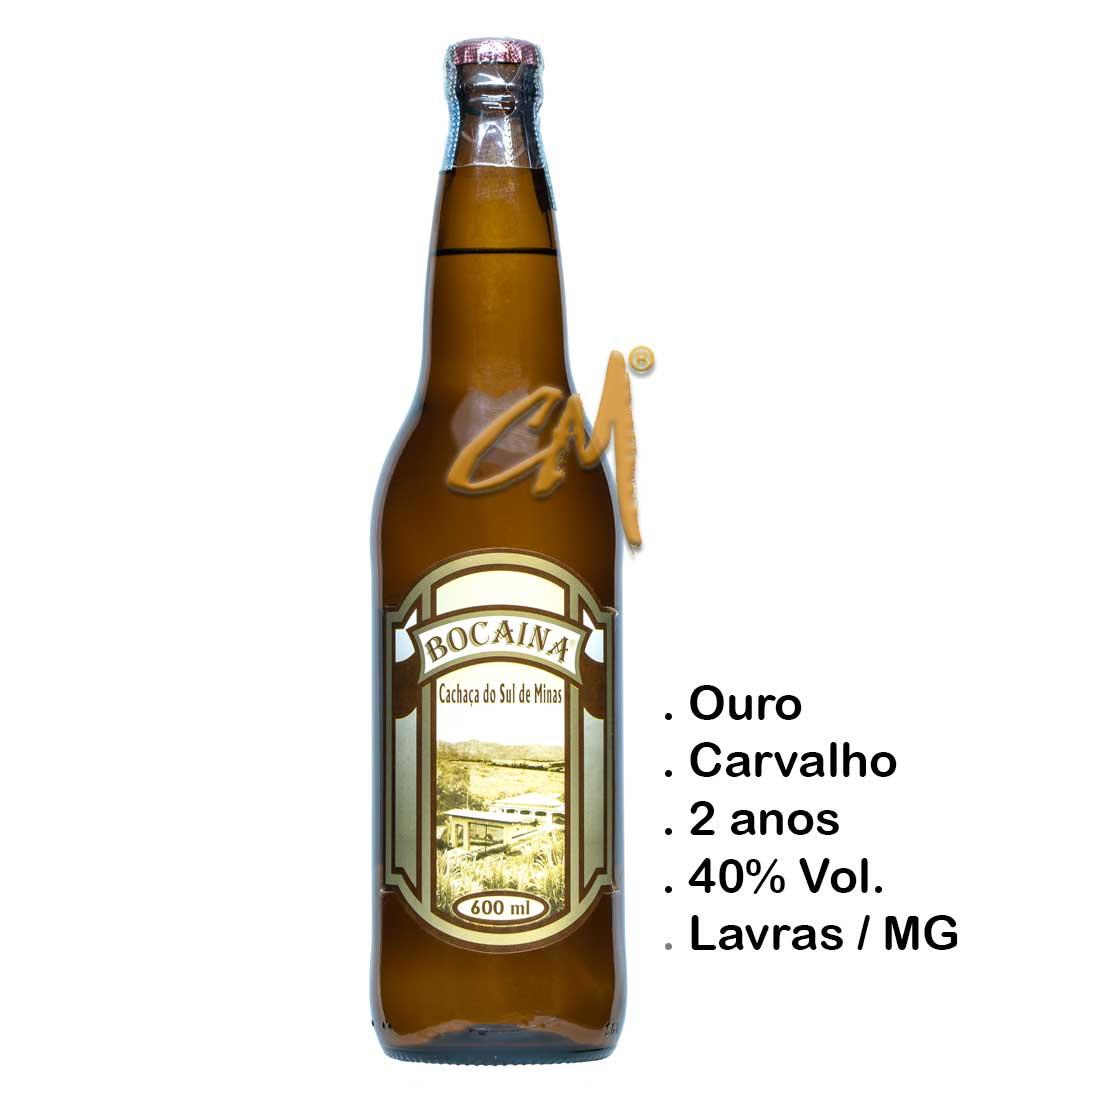 Cachaça Bocaina Carvalho 600 ml (Lavras - MG)